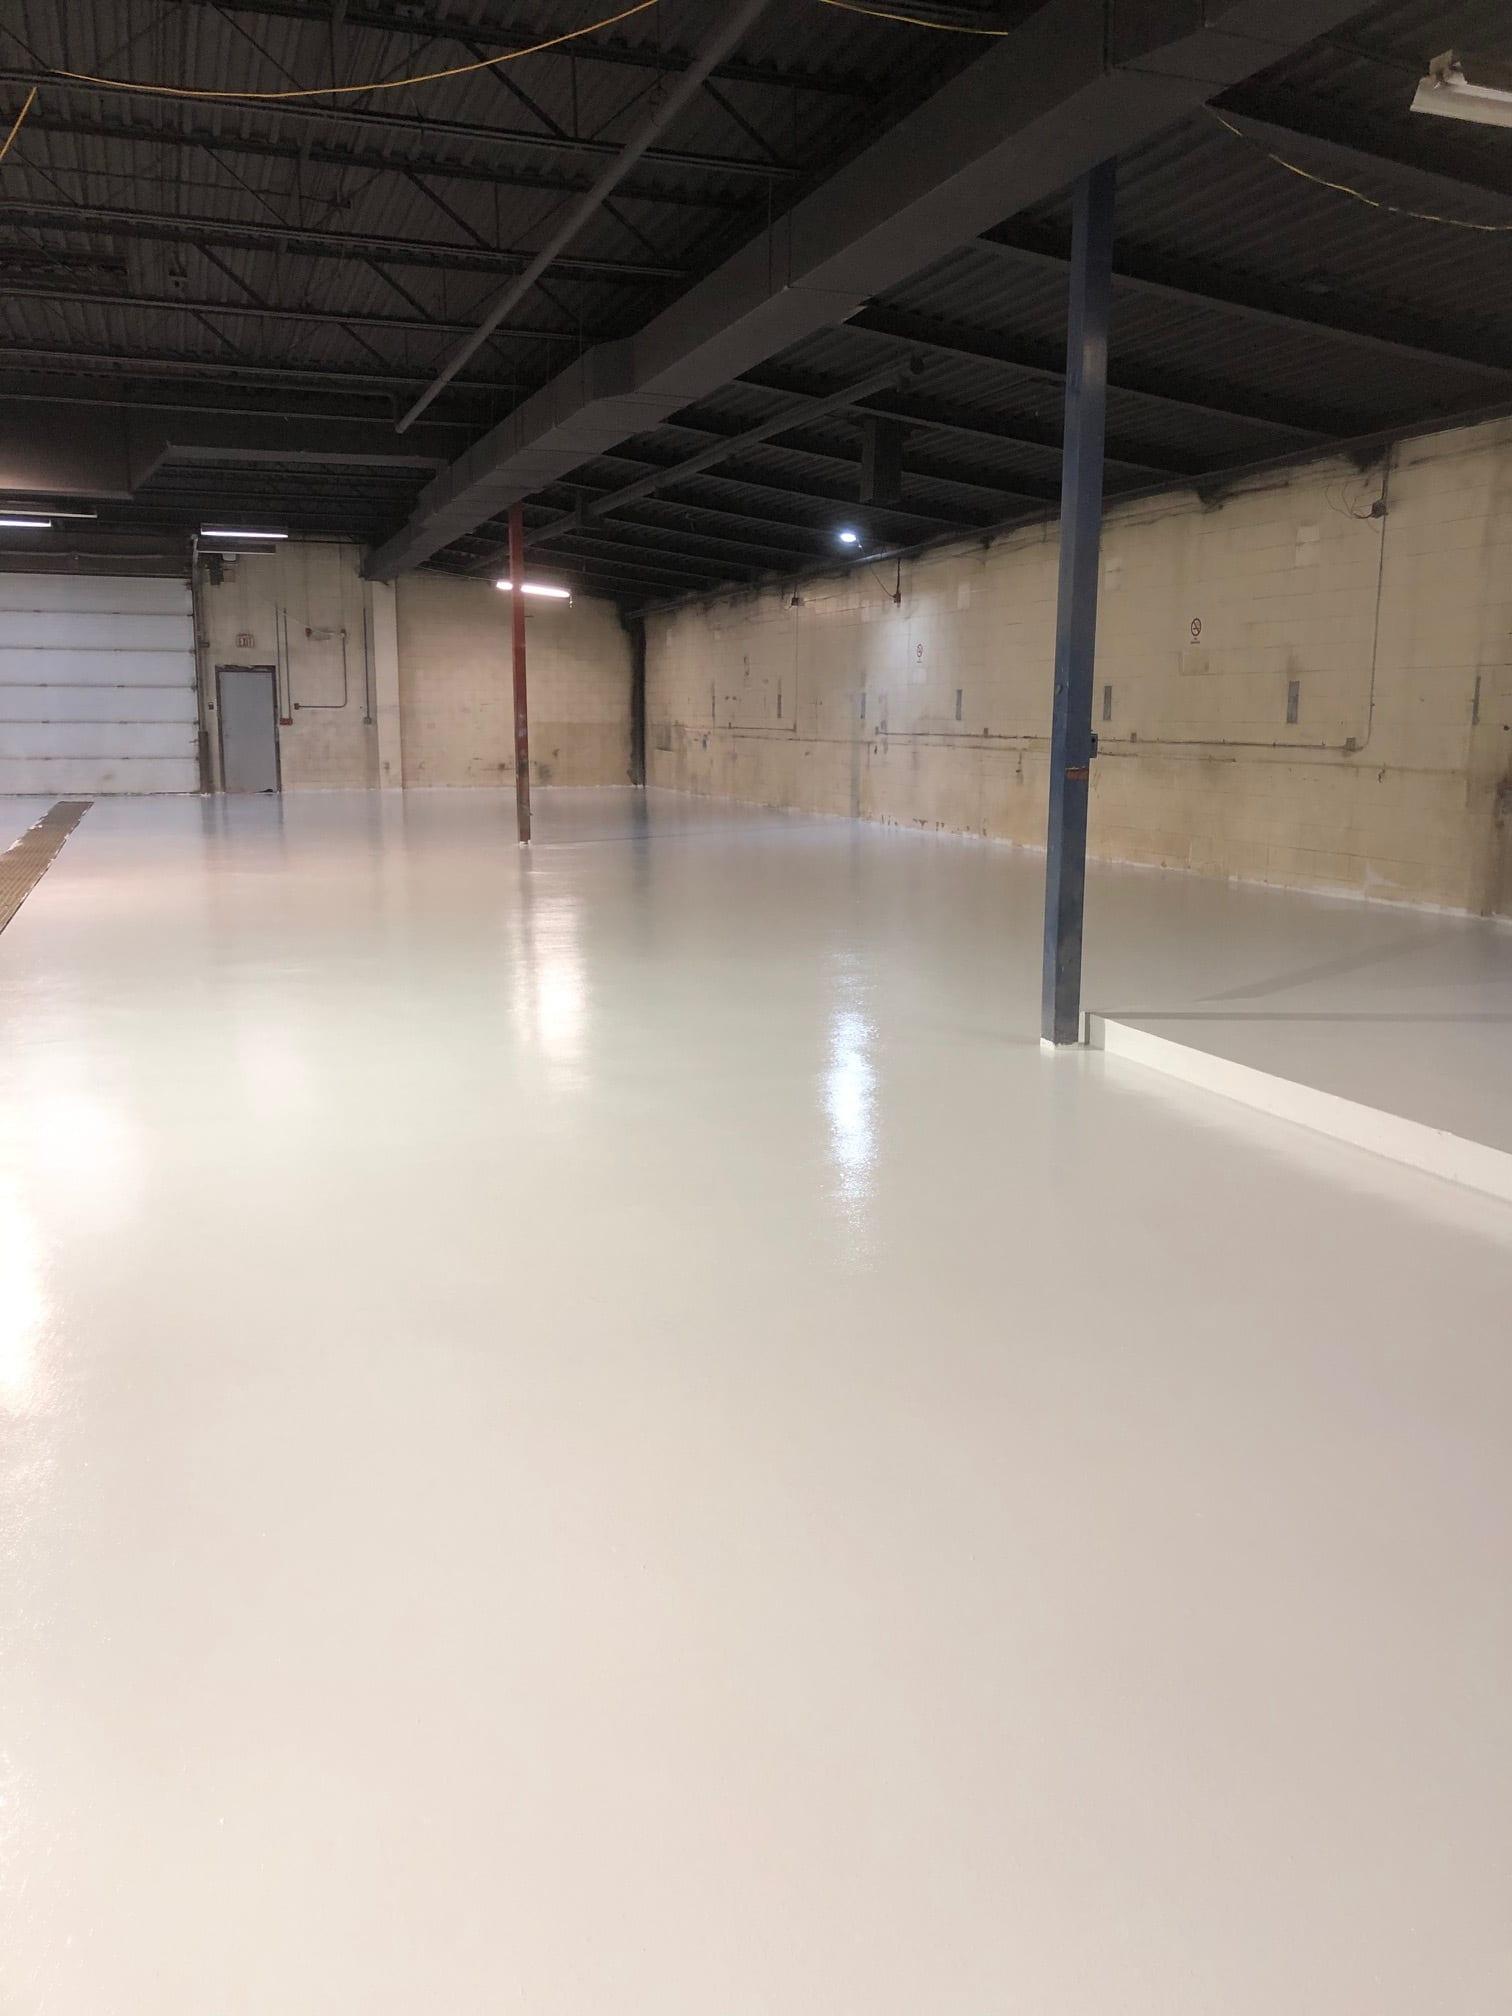 RexCoat seamless epoxy flooring - alternate angle of white epoxy flooring